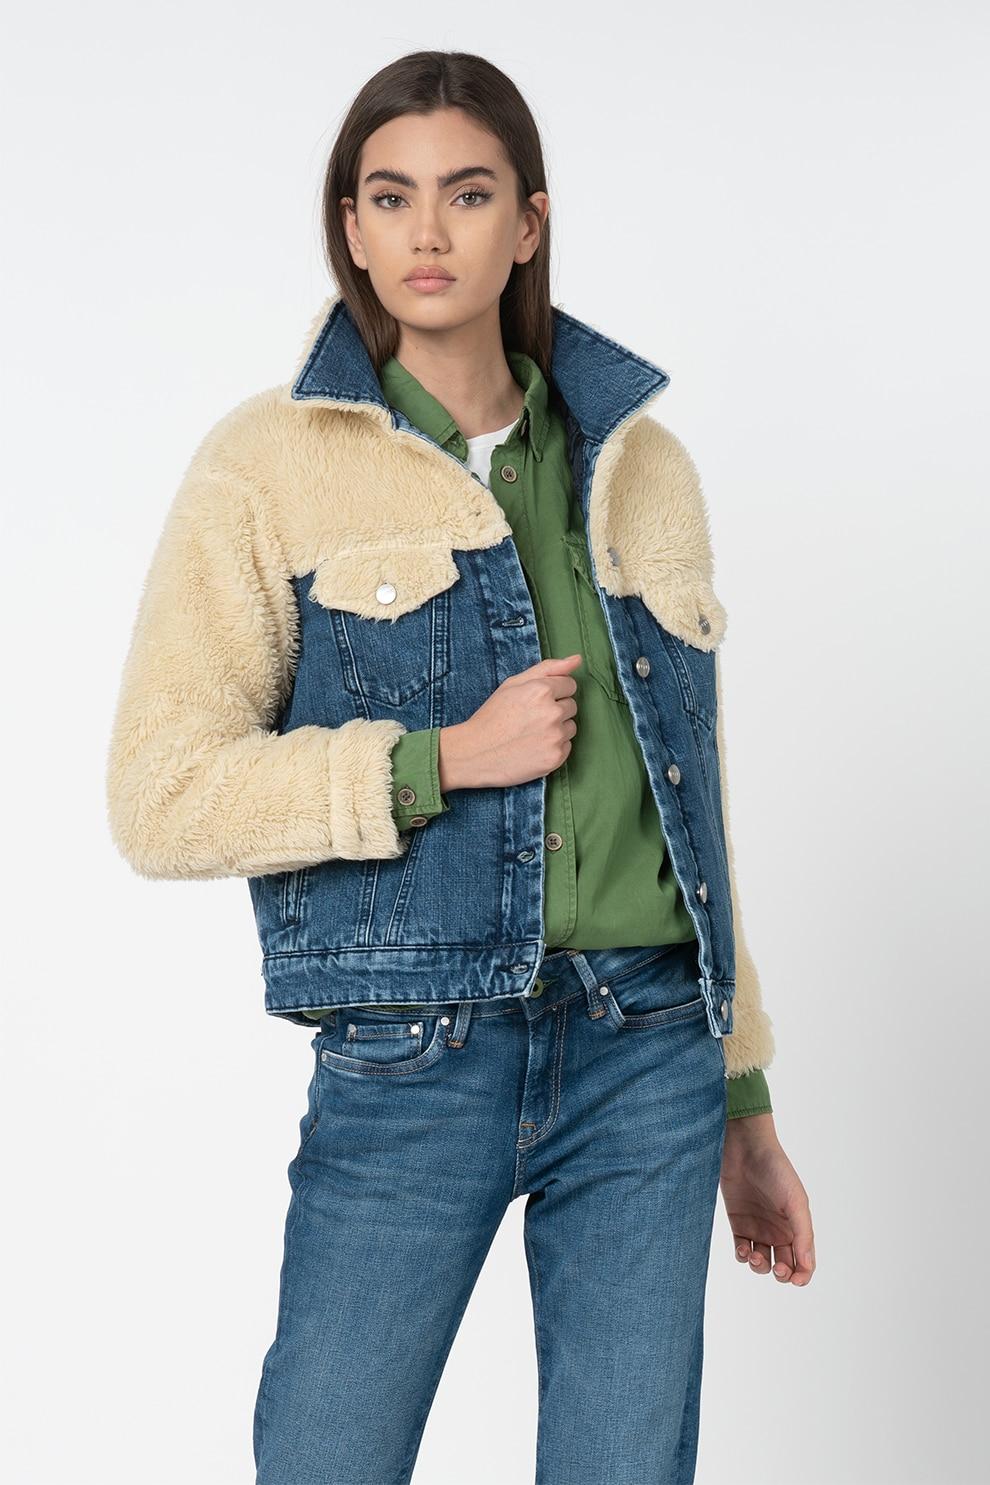 Pepe Jeans London, Bonny irha hatású dzseki eMAG.hu